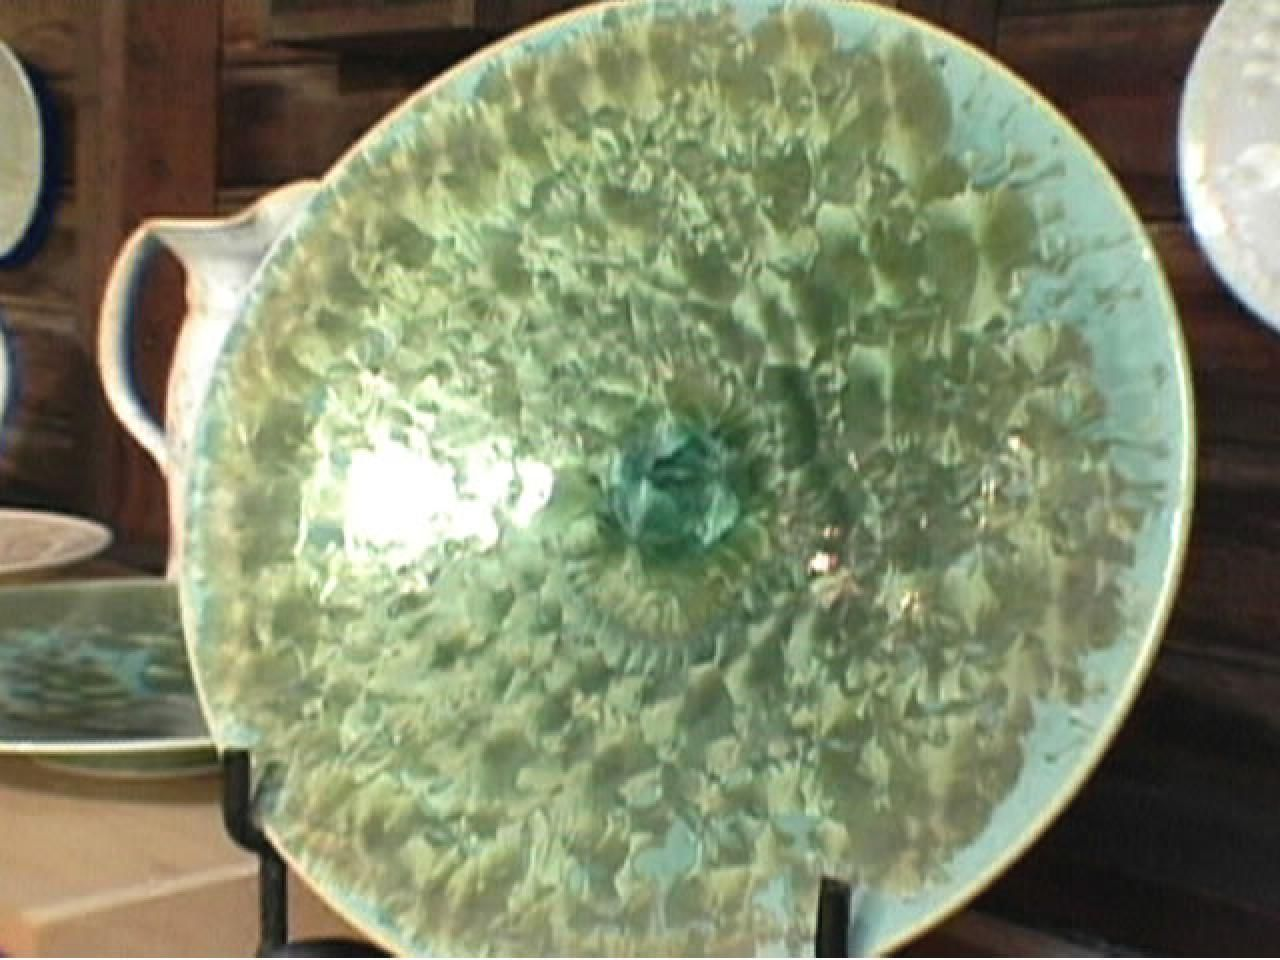 & How to Make an Ornate Ceramic Platter